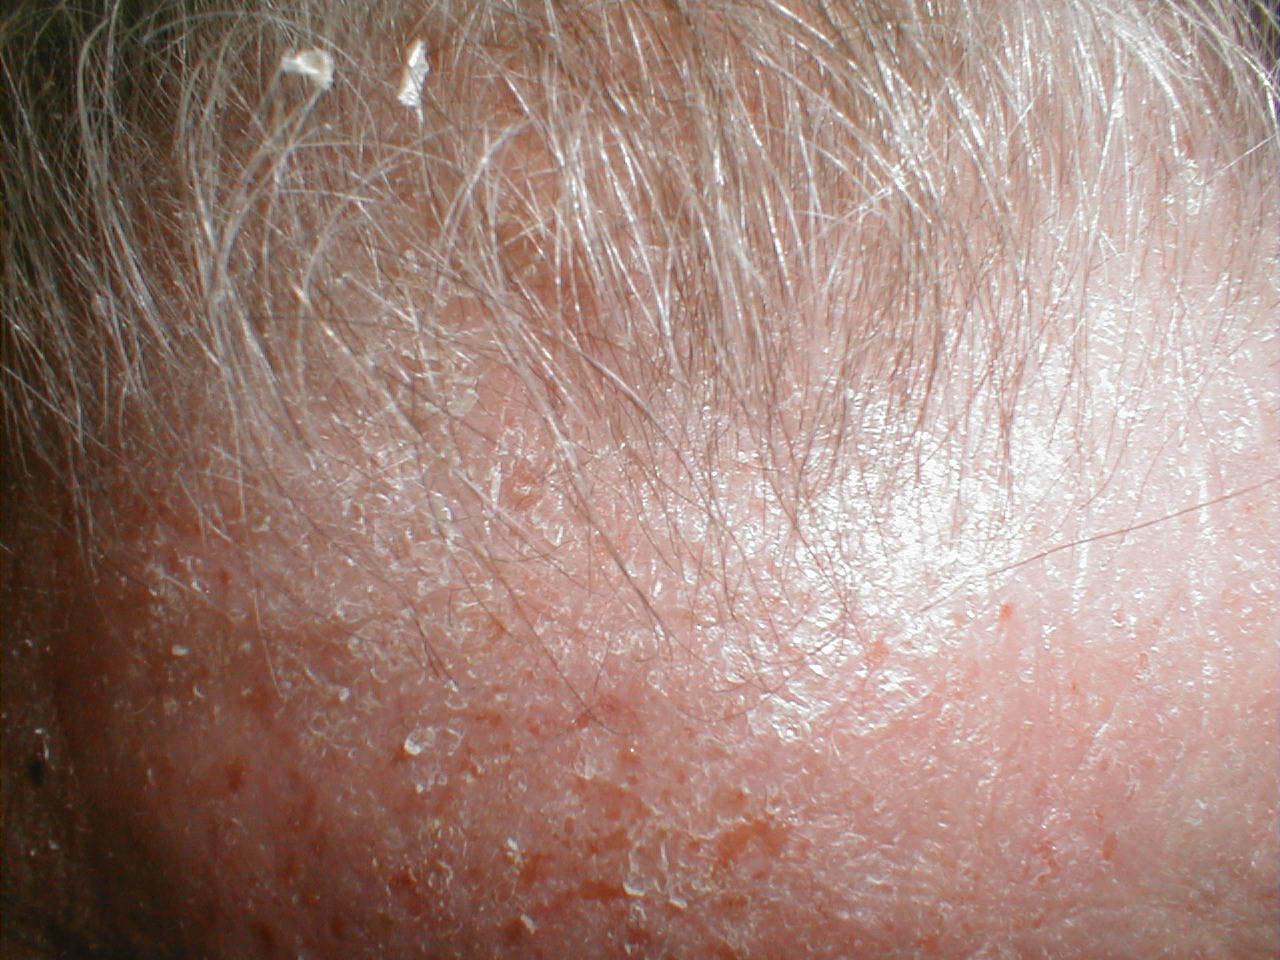 Atopic dermatitis: MedlinePlus Medical Encyclopedia